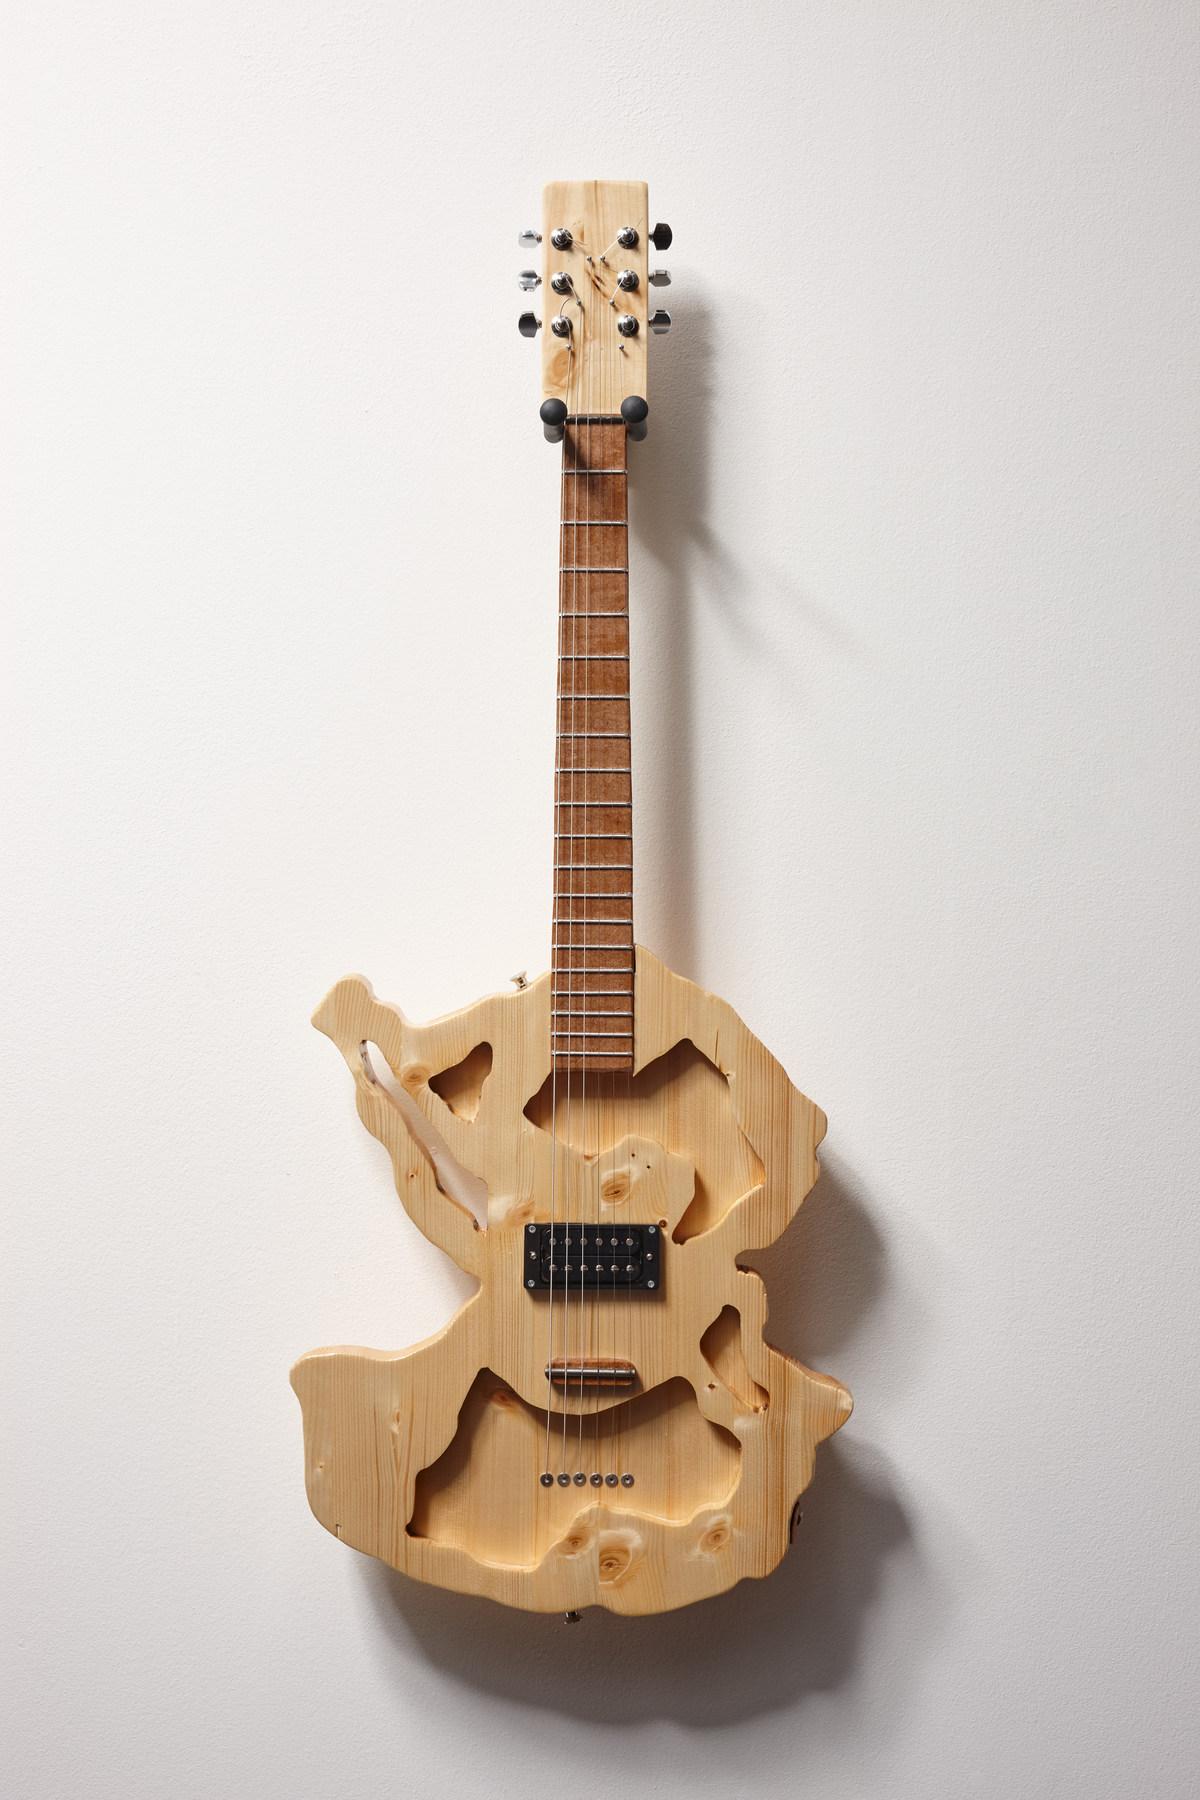 Flavio Merlo - Guitar III, 2015